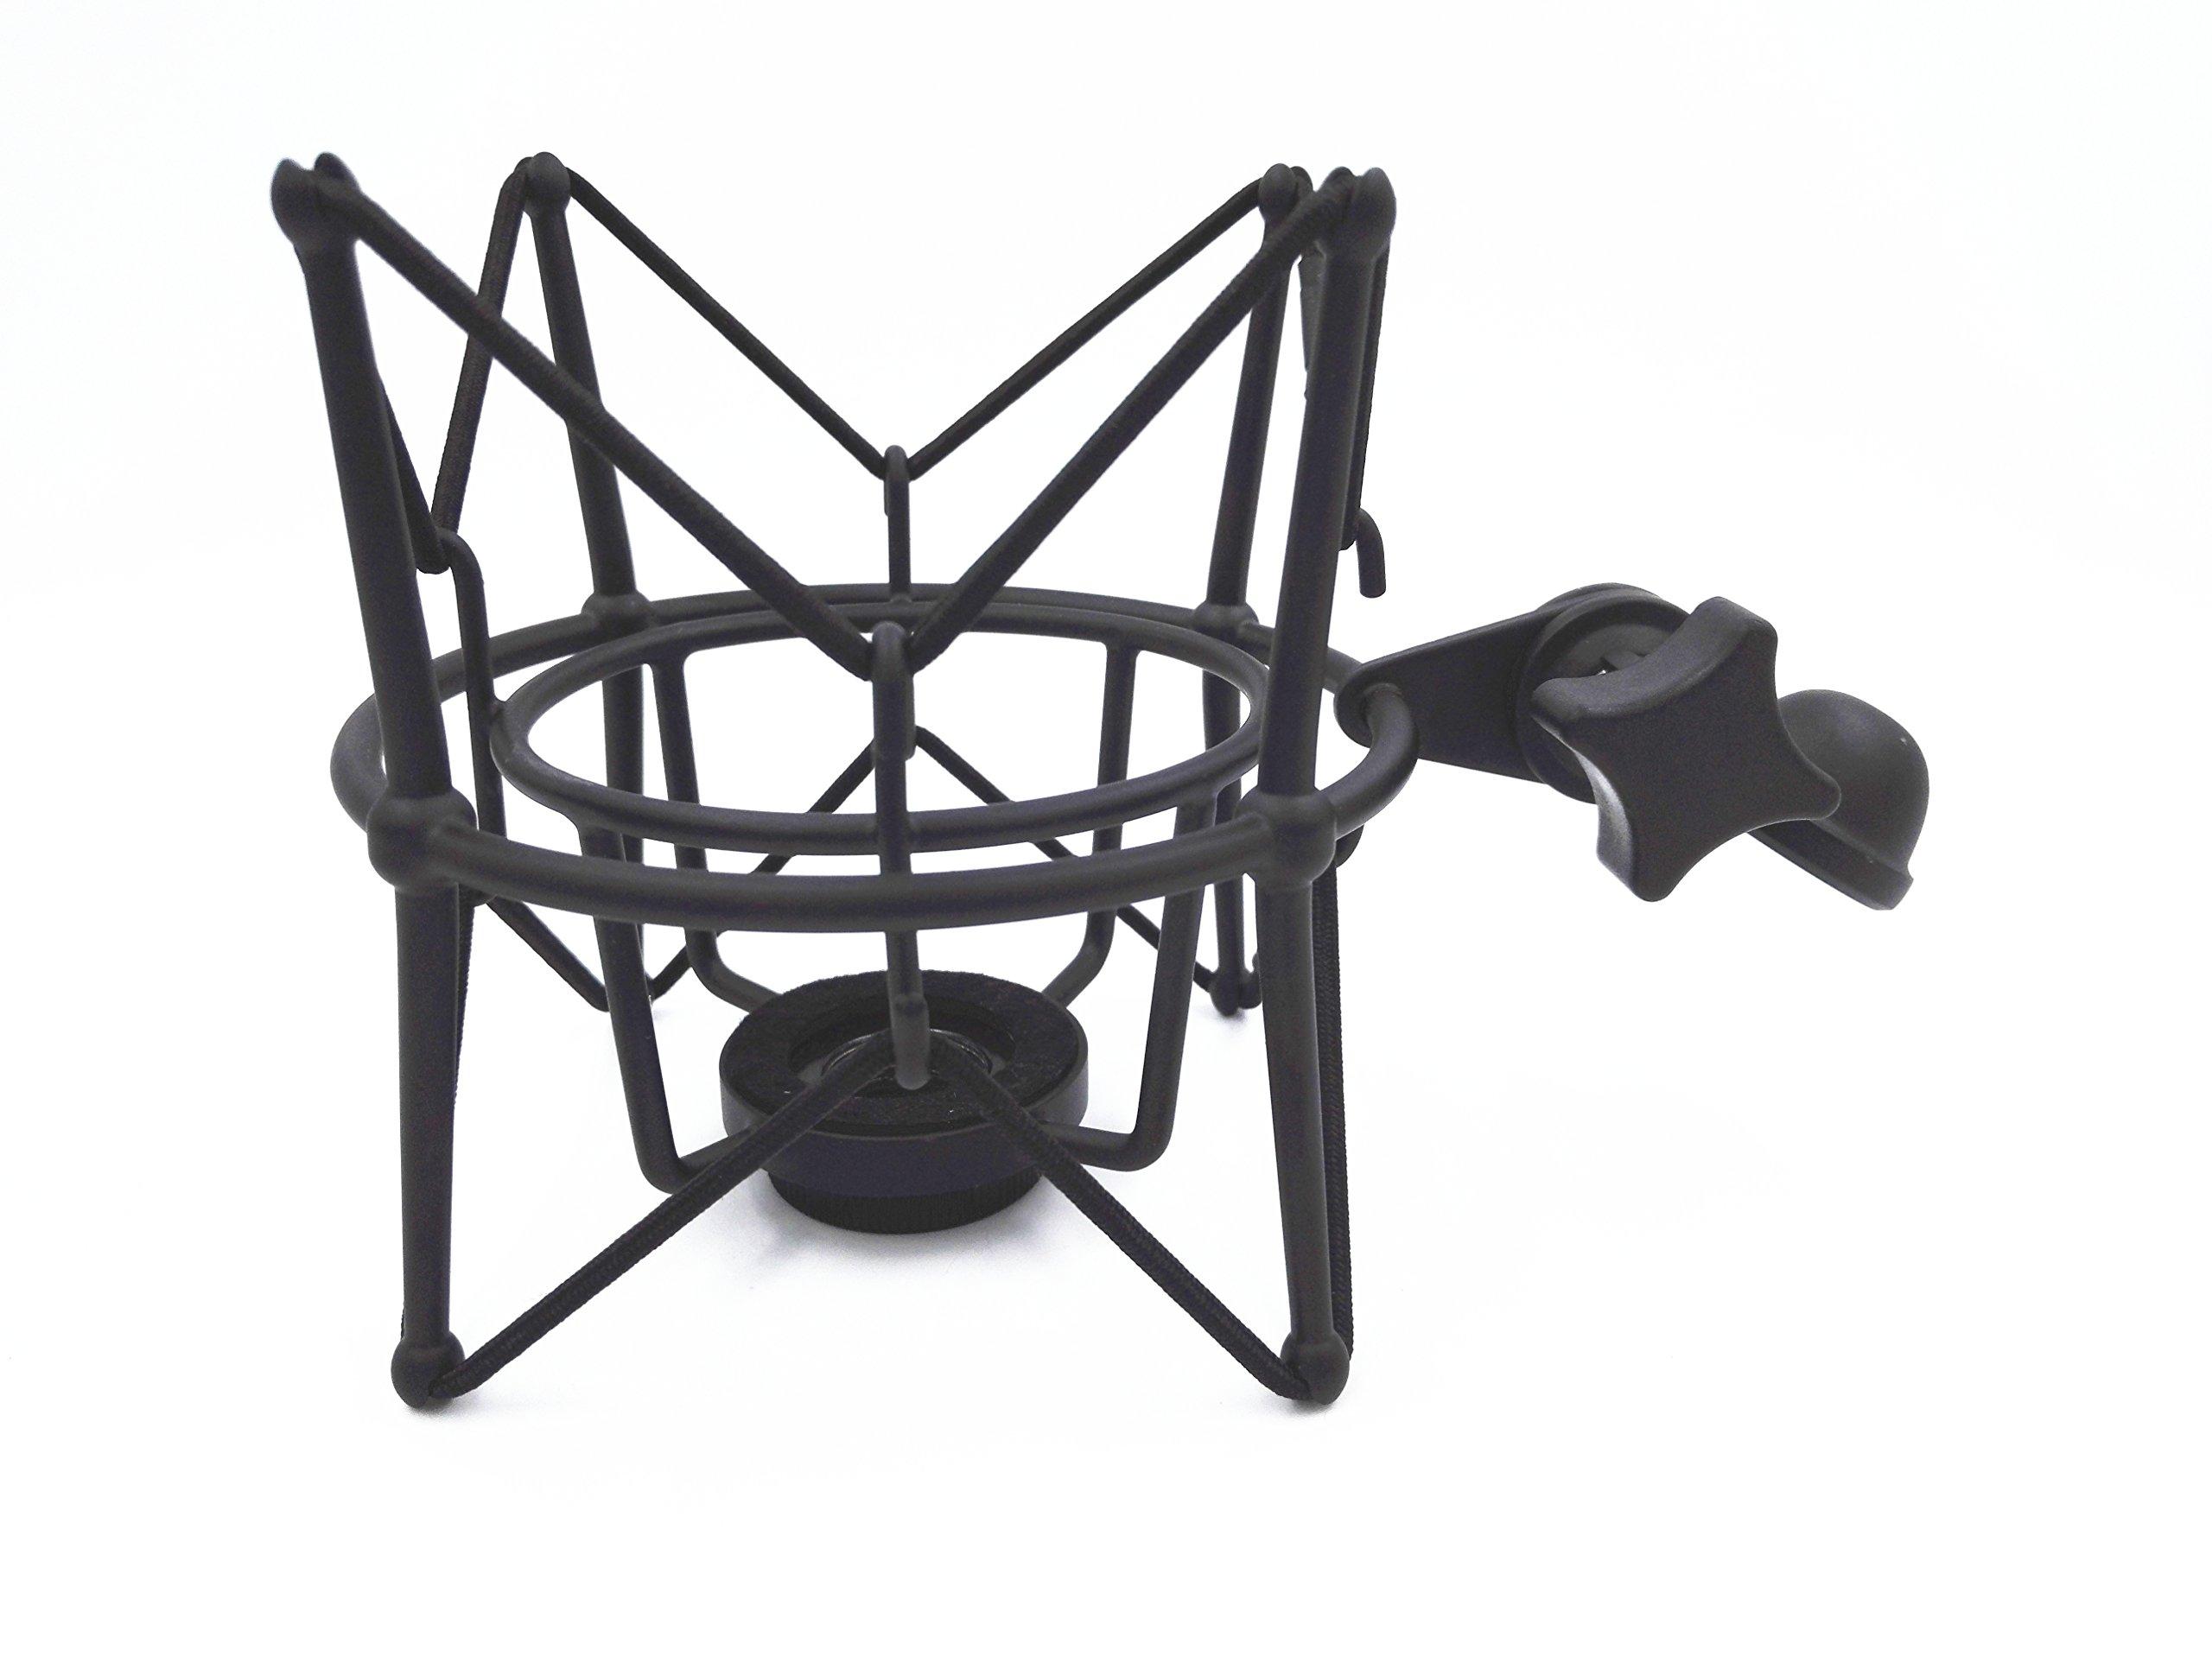 Boseen Studio Condenser Metal Microphone Spider Shock Mount Holder Clip Anti Vibration Suspension High Isolation, Ideal for Radio Broadcasting Studio, Voice-over Sound Studio and Recording(Black)